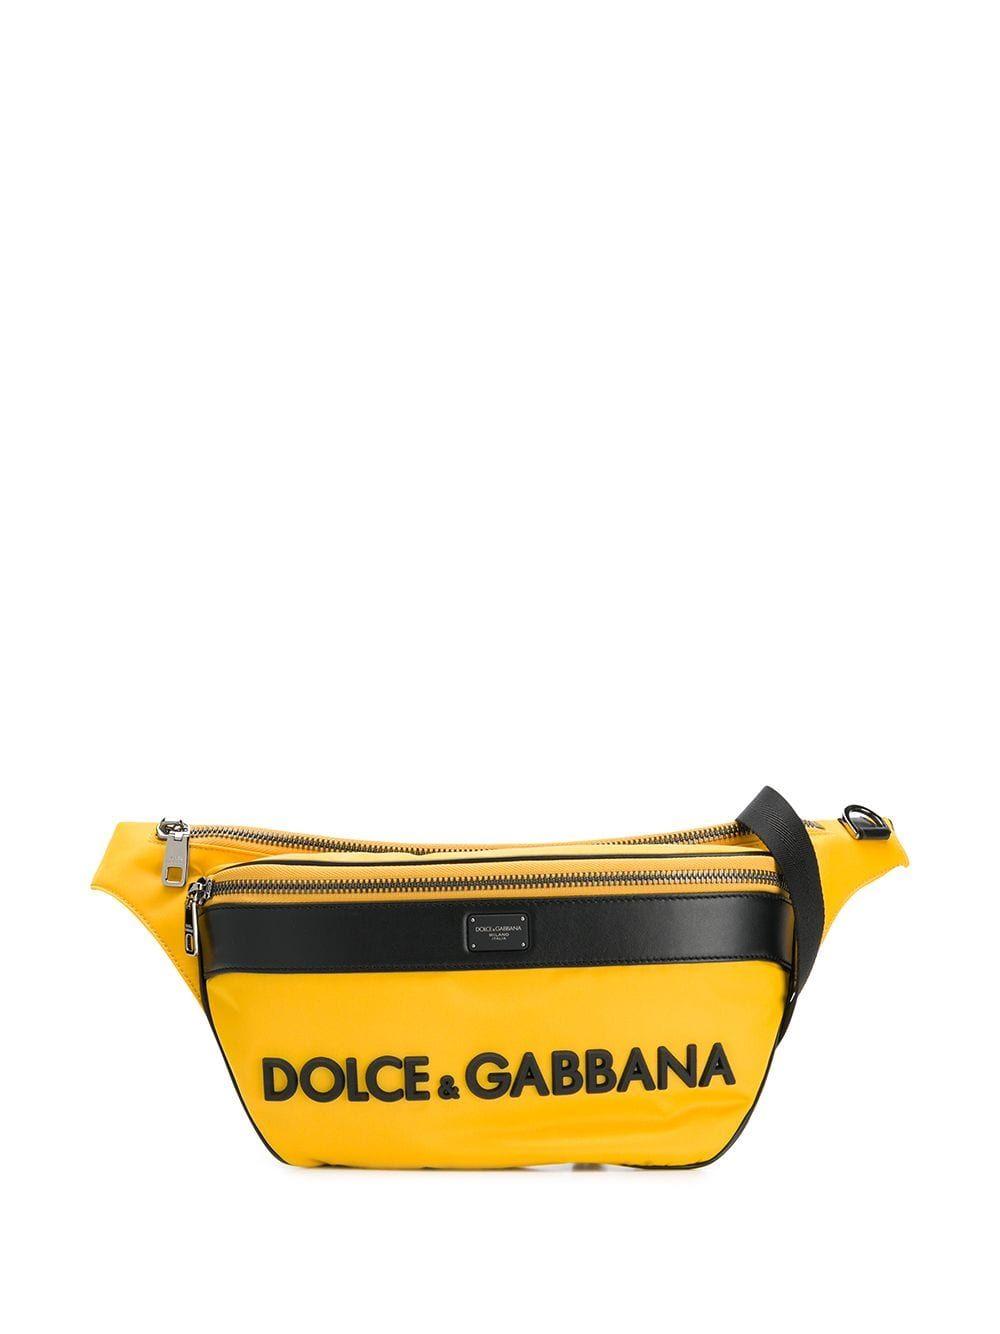 1877c46013c Dolce & Gabbana oversized logo belt bag - Yellow | Products in 2019 ...